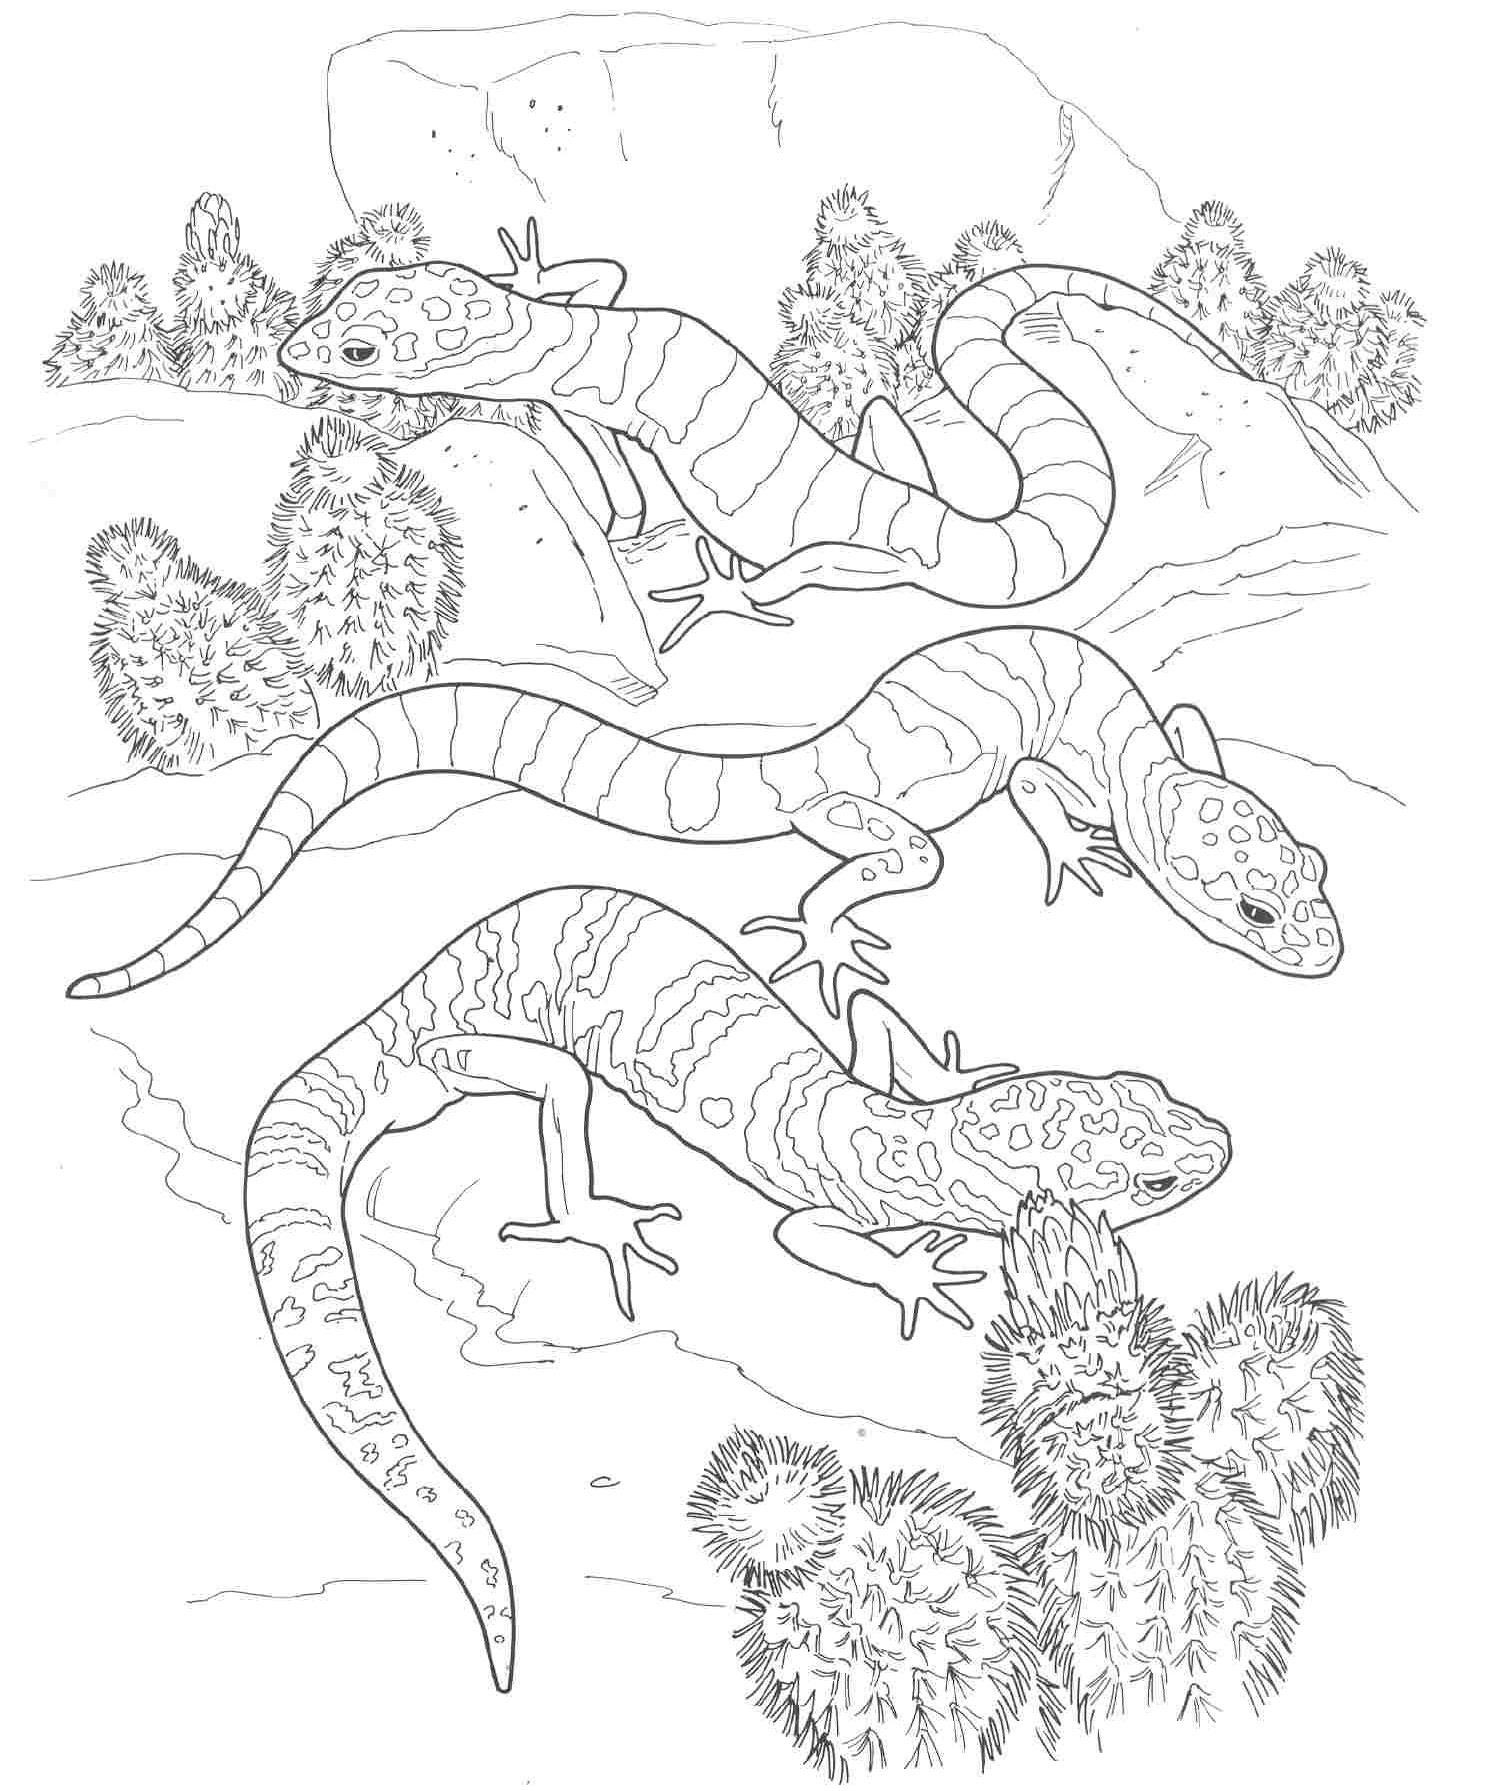 Desert Coloring Pages Printable at GetDrawings.com   Free ...